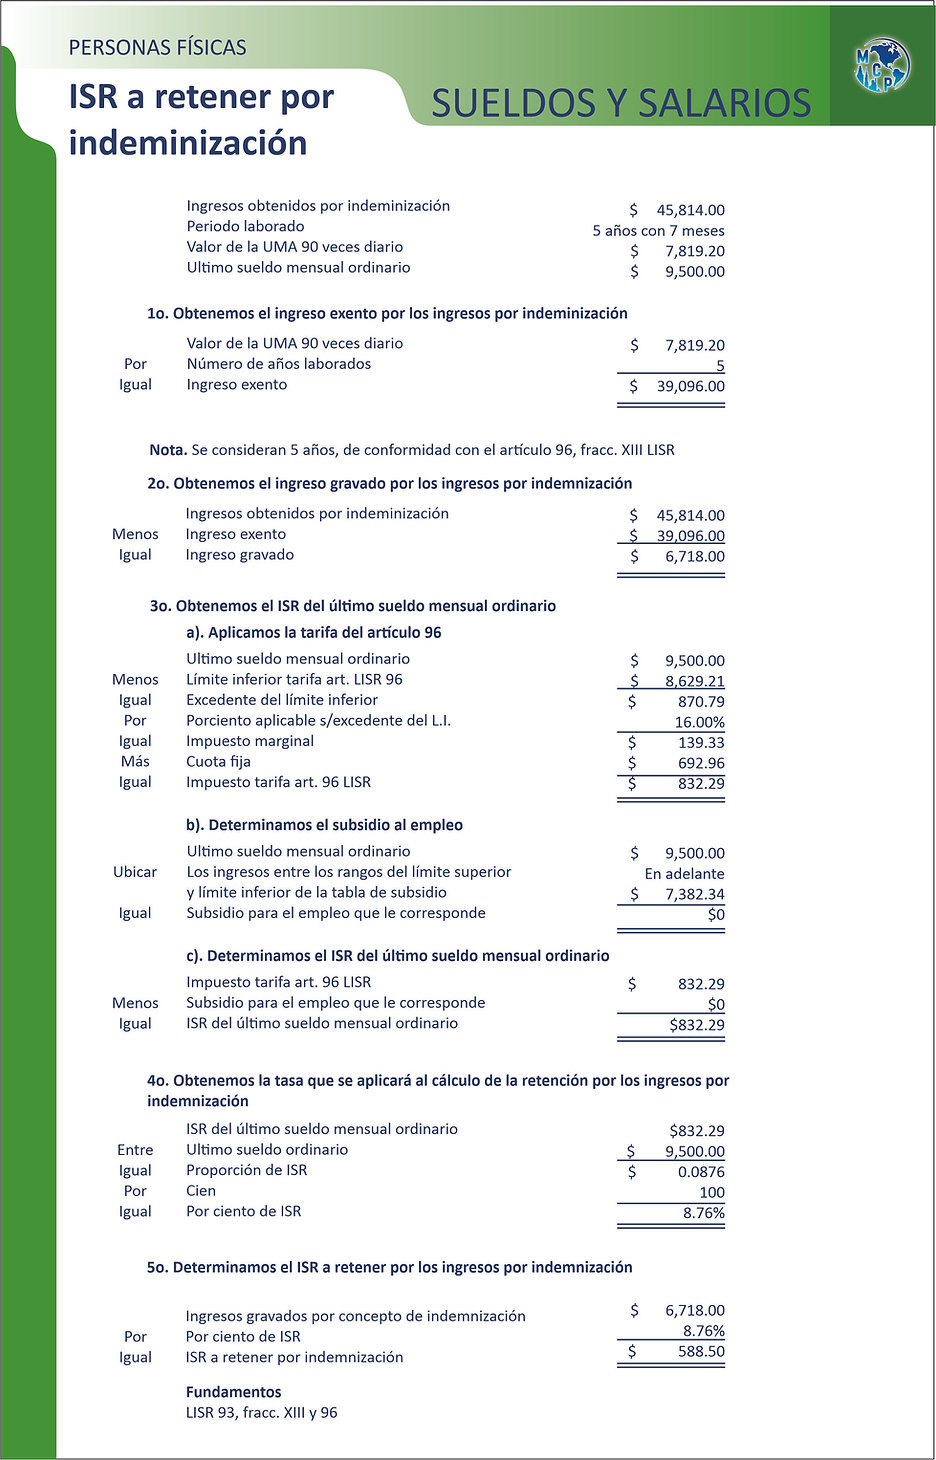 ISR a retener por indemnizacion.jpg